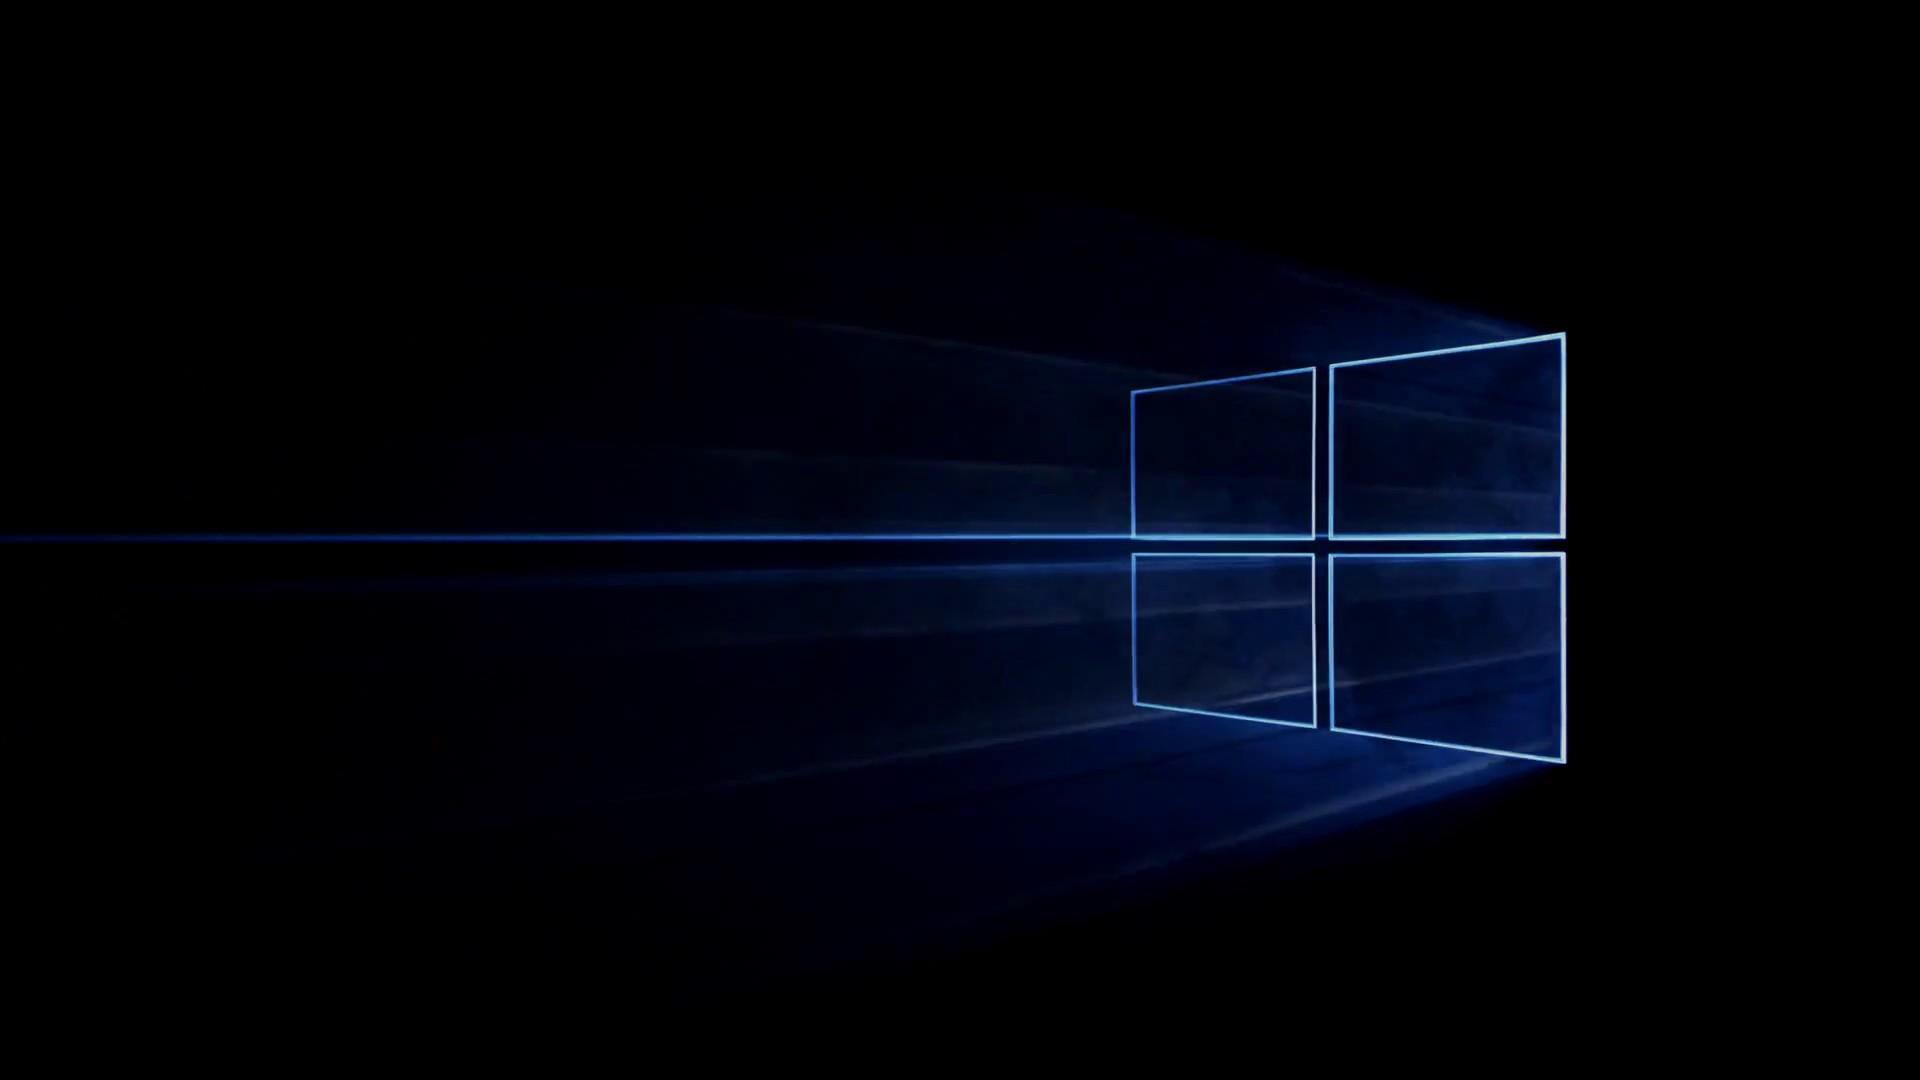 Microsoft Reveals the Official Windows 10 Wallpaper 1920x1080